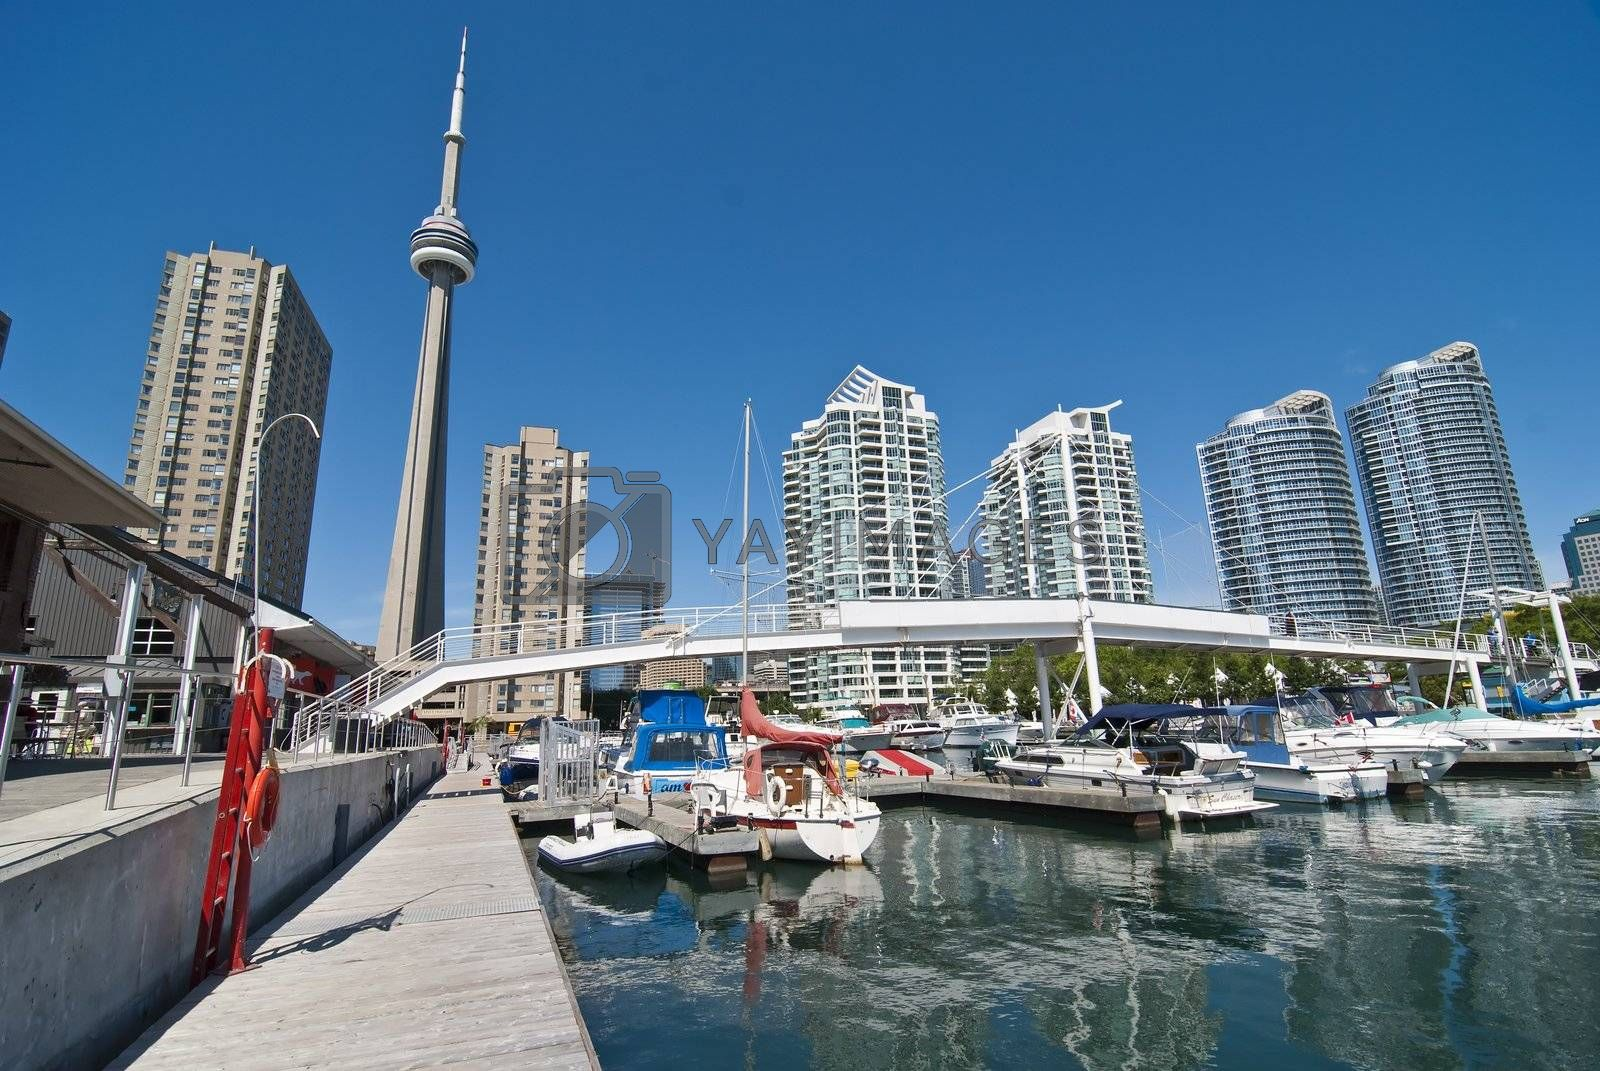 Architectural Detail of Toronto, Ontario, Canada, 2008 by jovannig